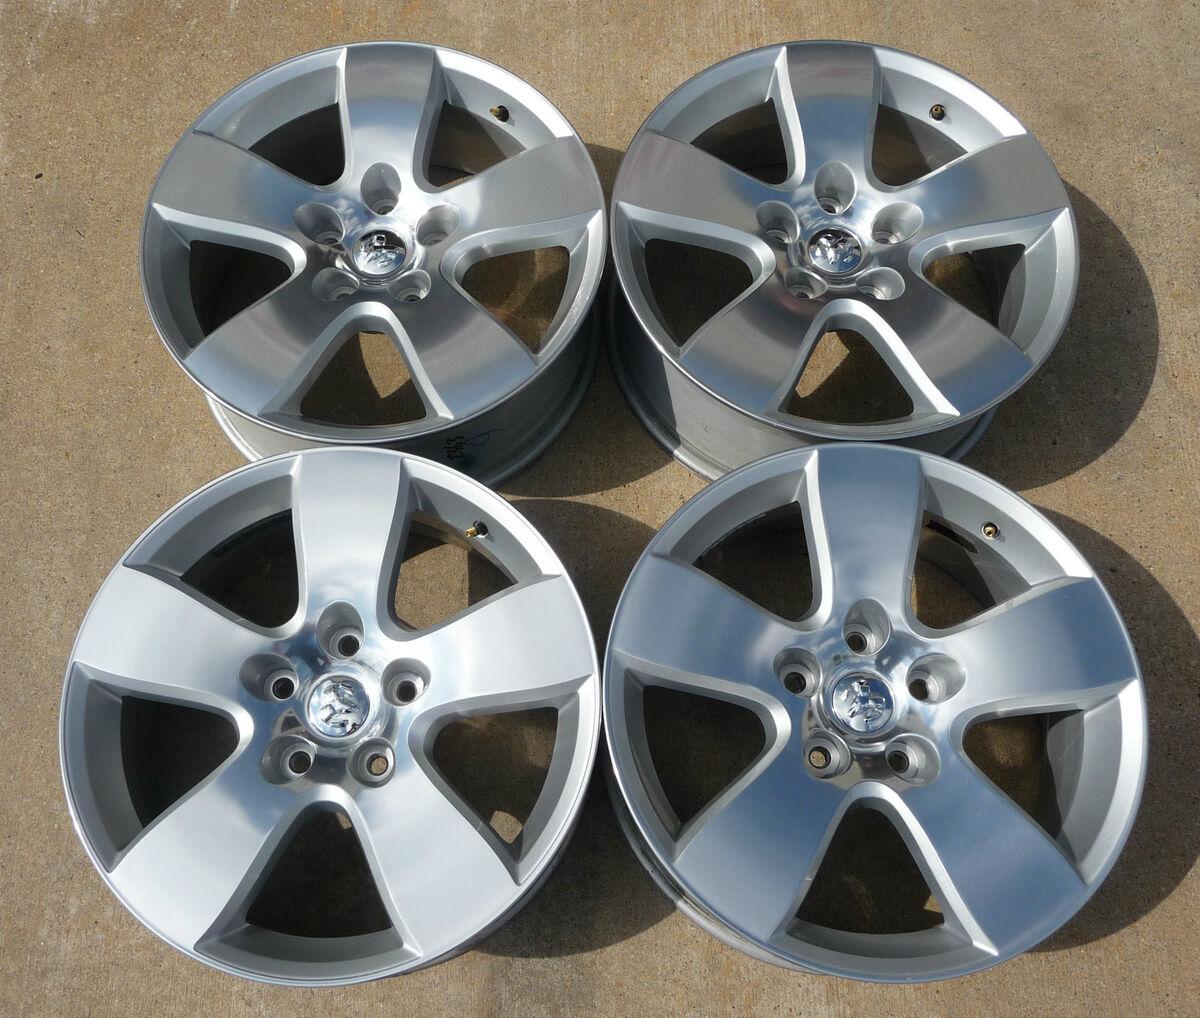 2002 2013 Dodge RAM 1500 20 Alloy Wheels Caps 2363